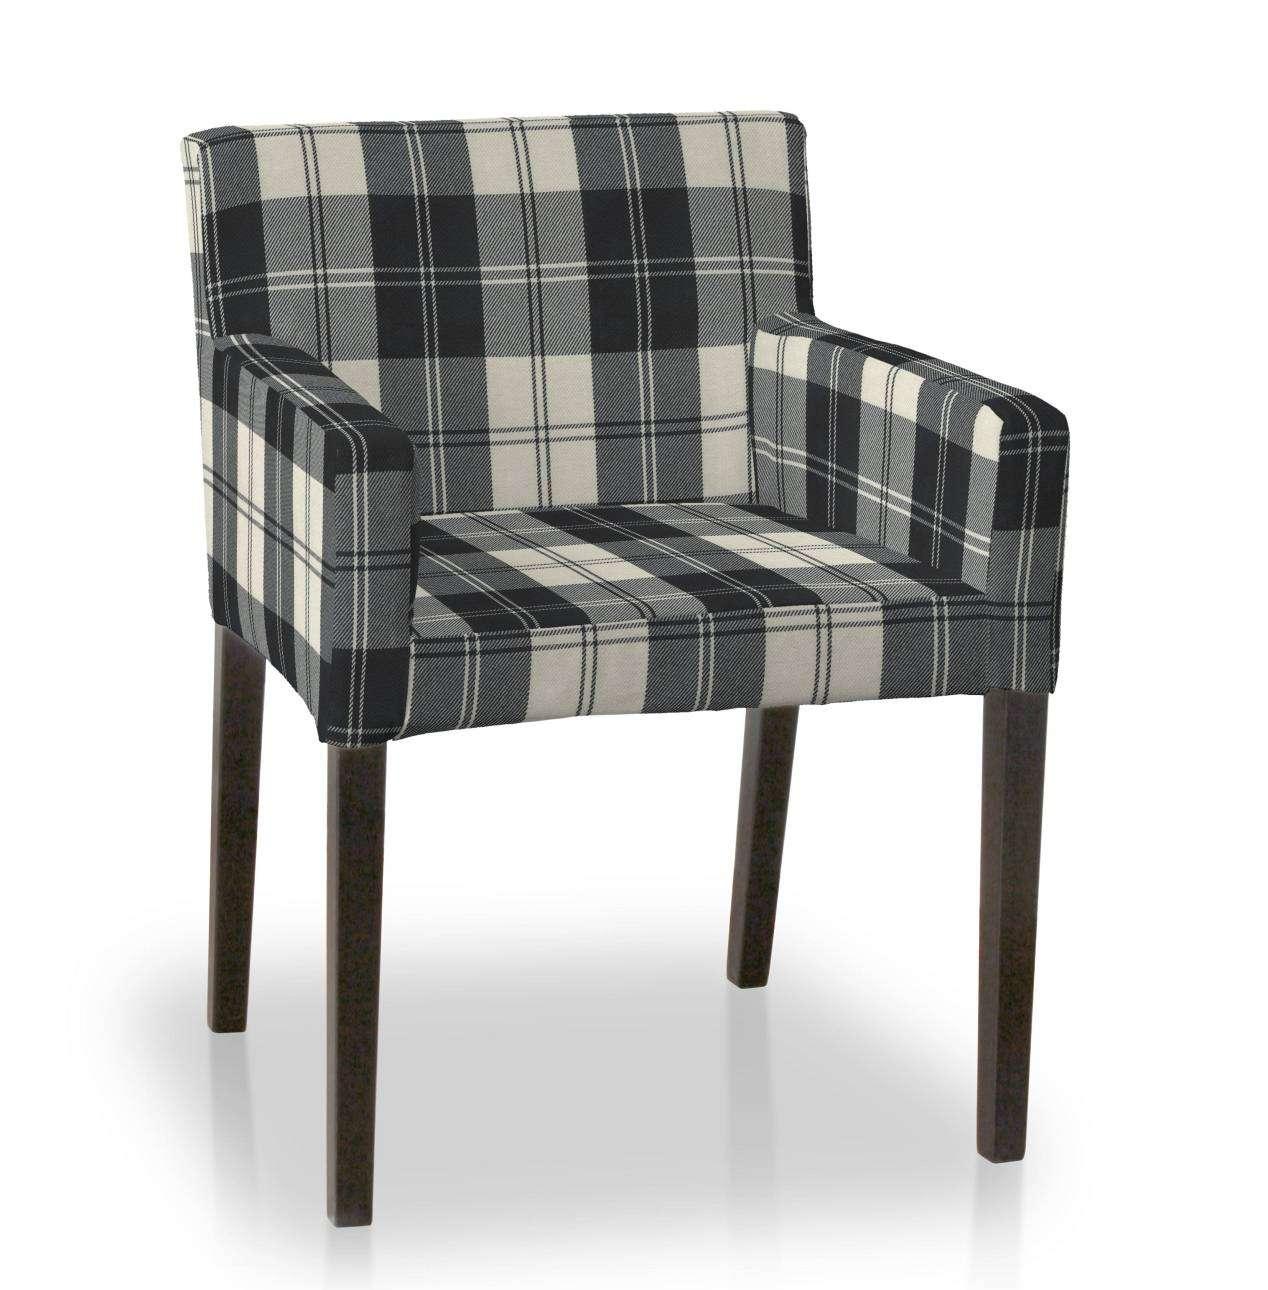 Návlek na stoličku s opierkami Nils V kolekcii Edinburg, tkanina: 115-74